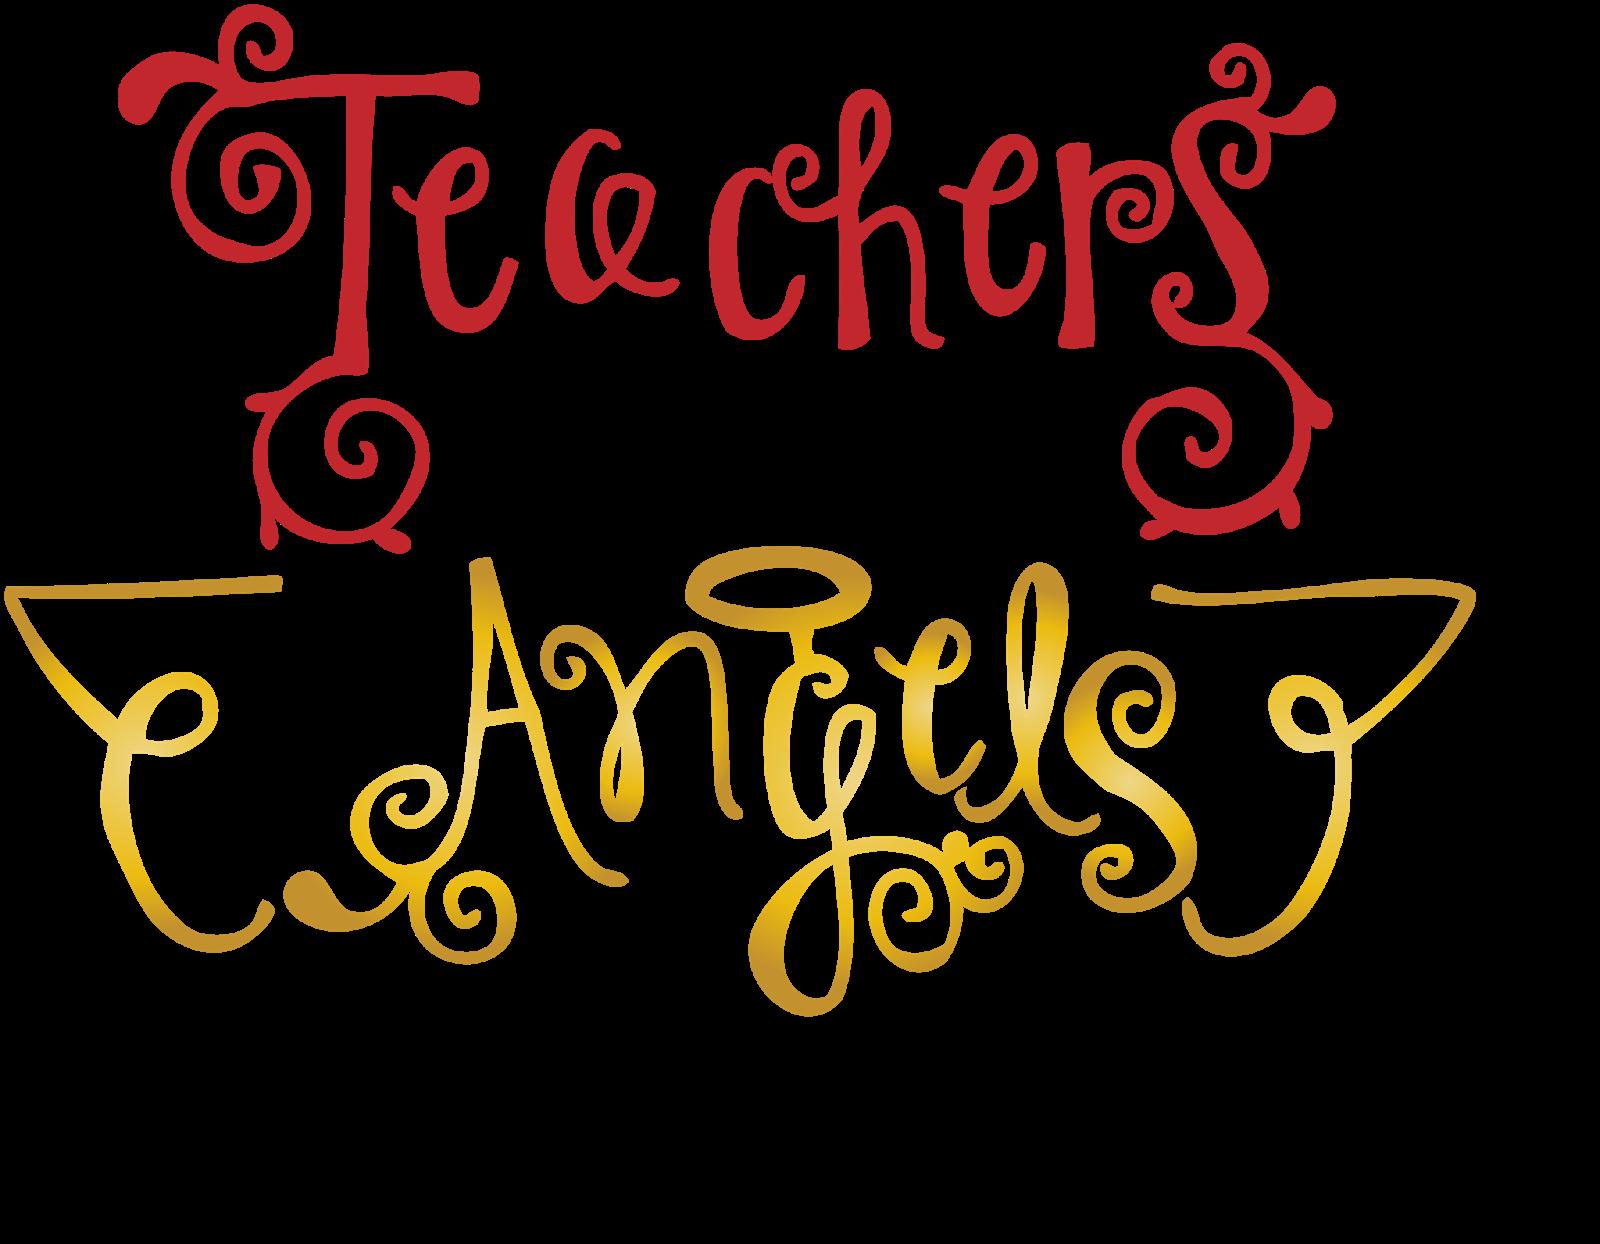 jpg royalty free download Great clipart proper. Best for teachers melonheadz